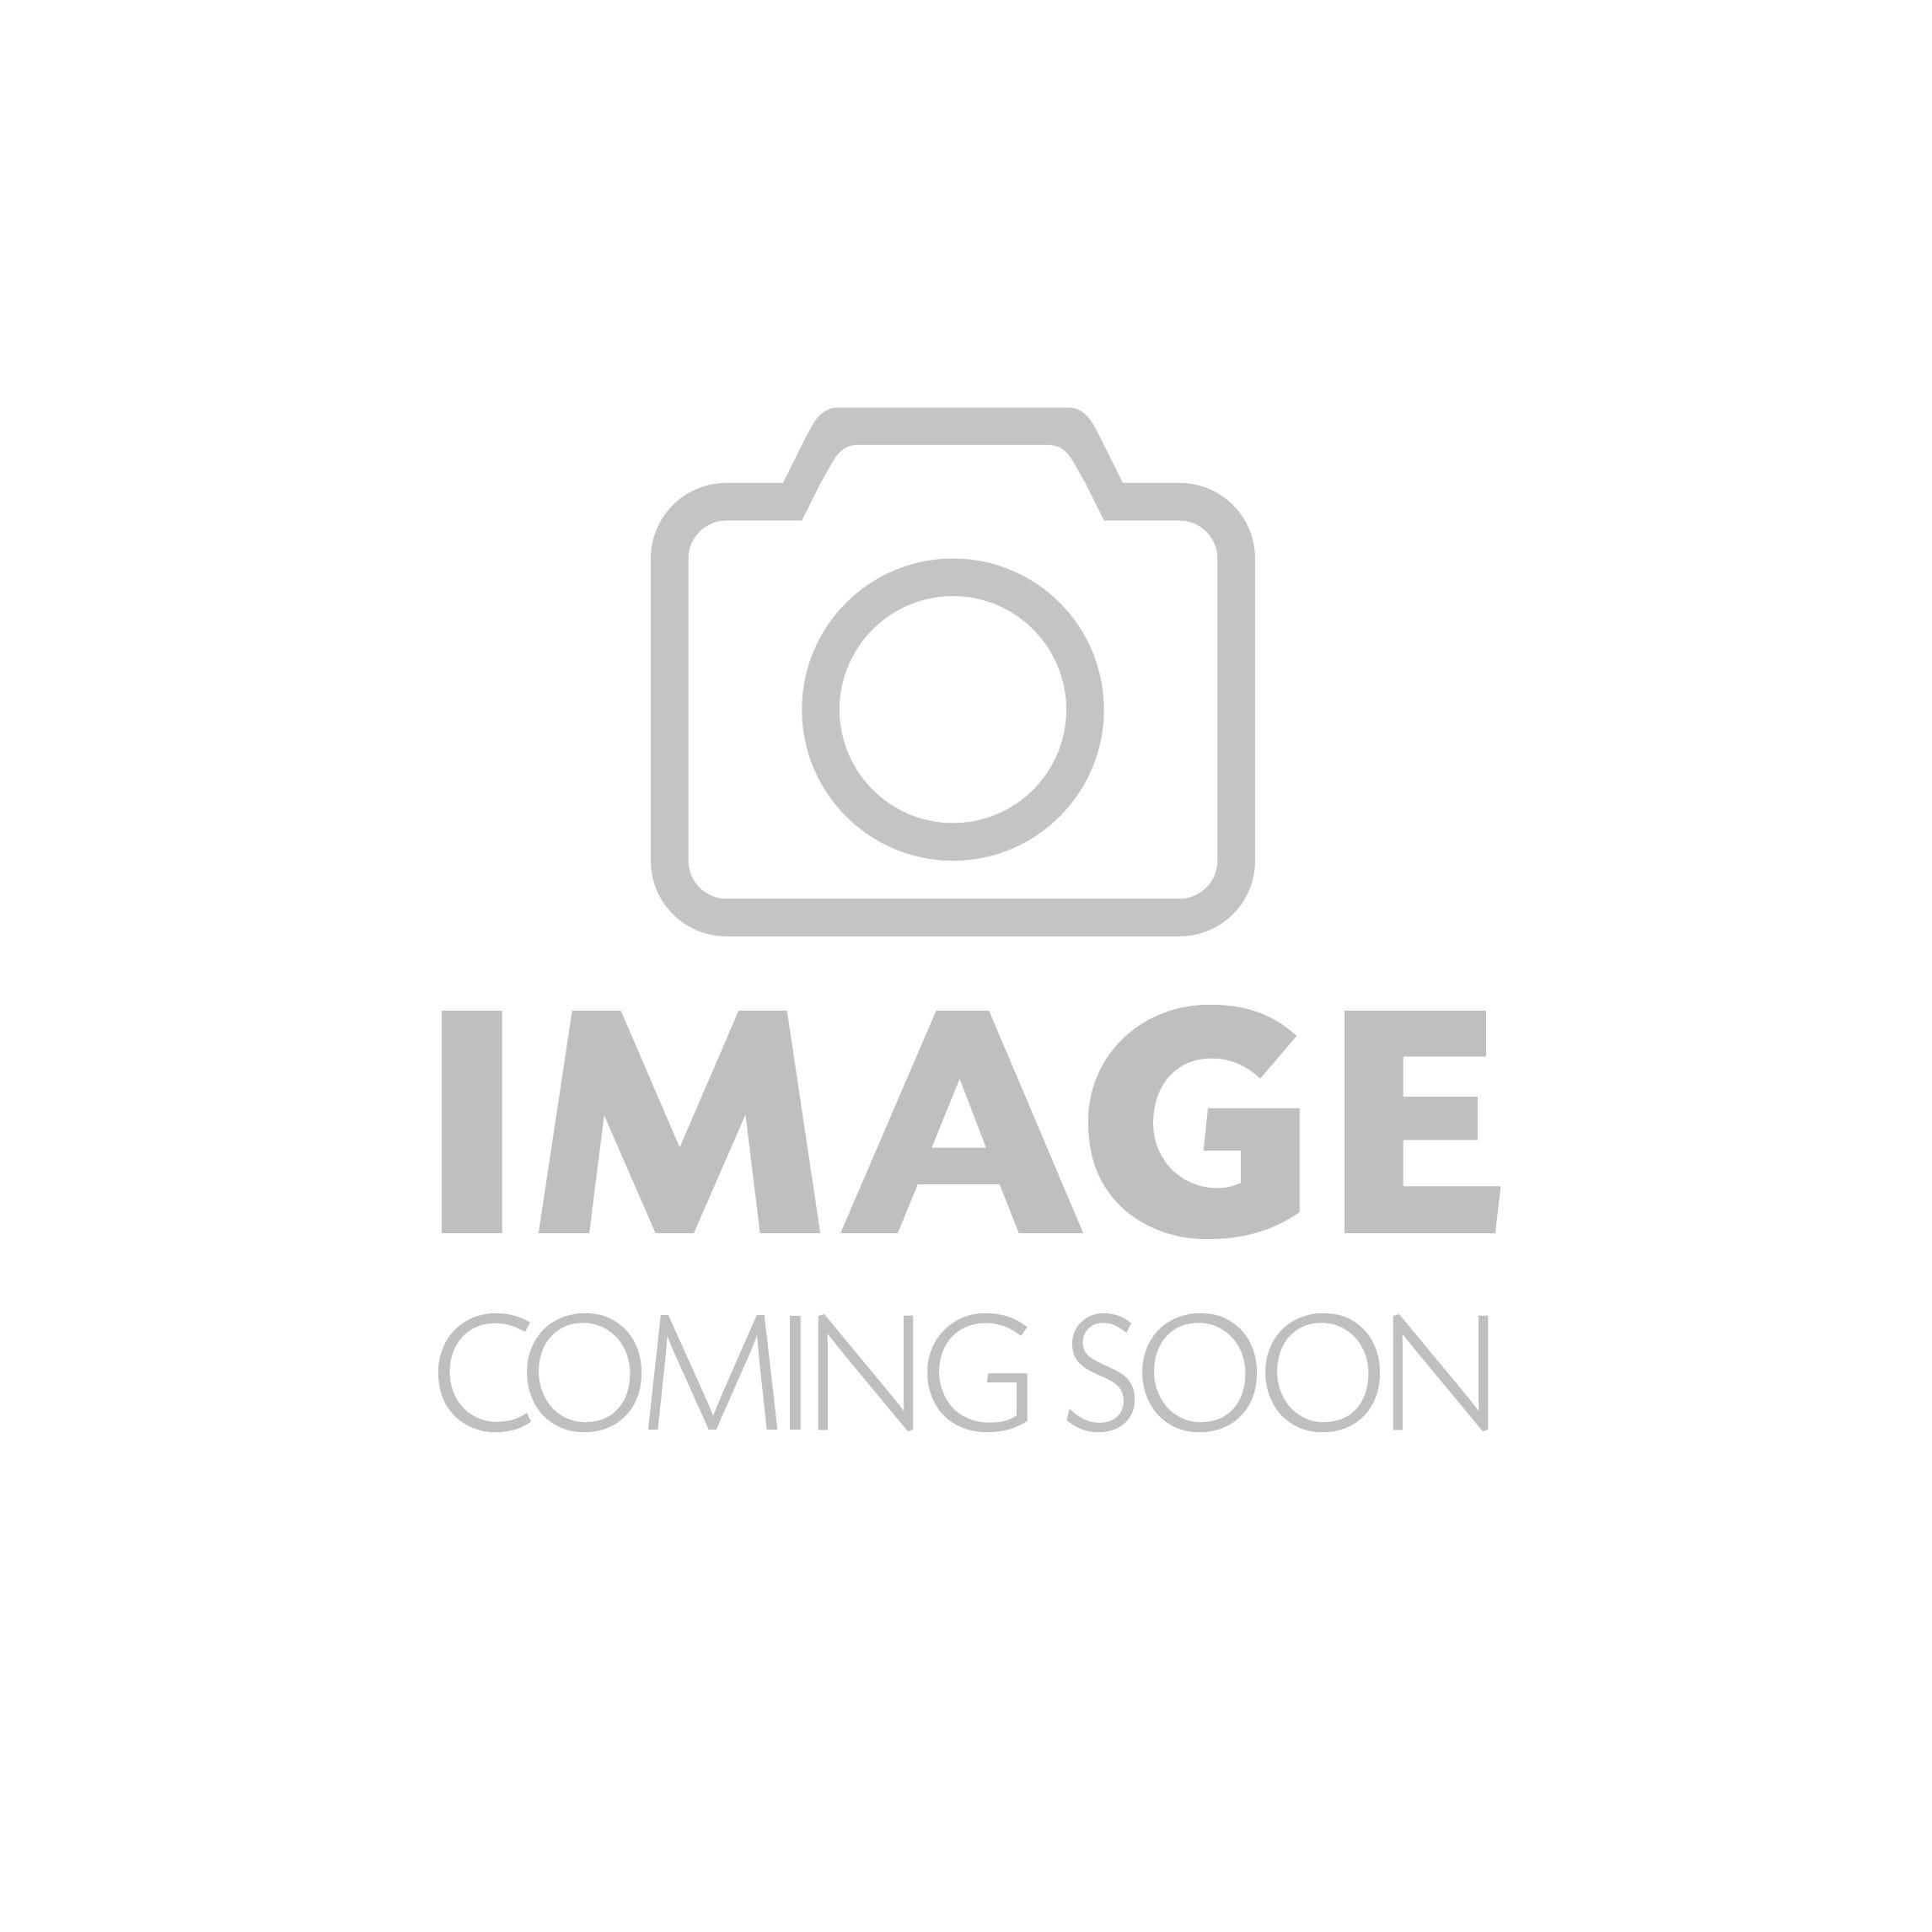 Merlyn Black Swivel Panel 300mm